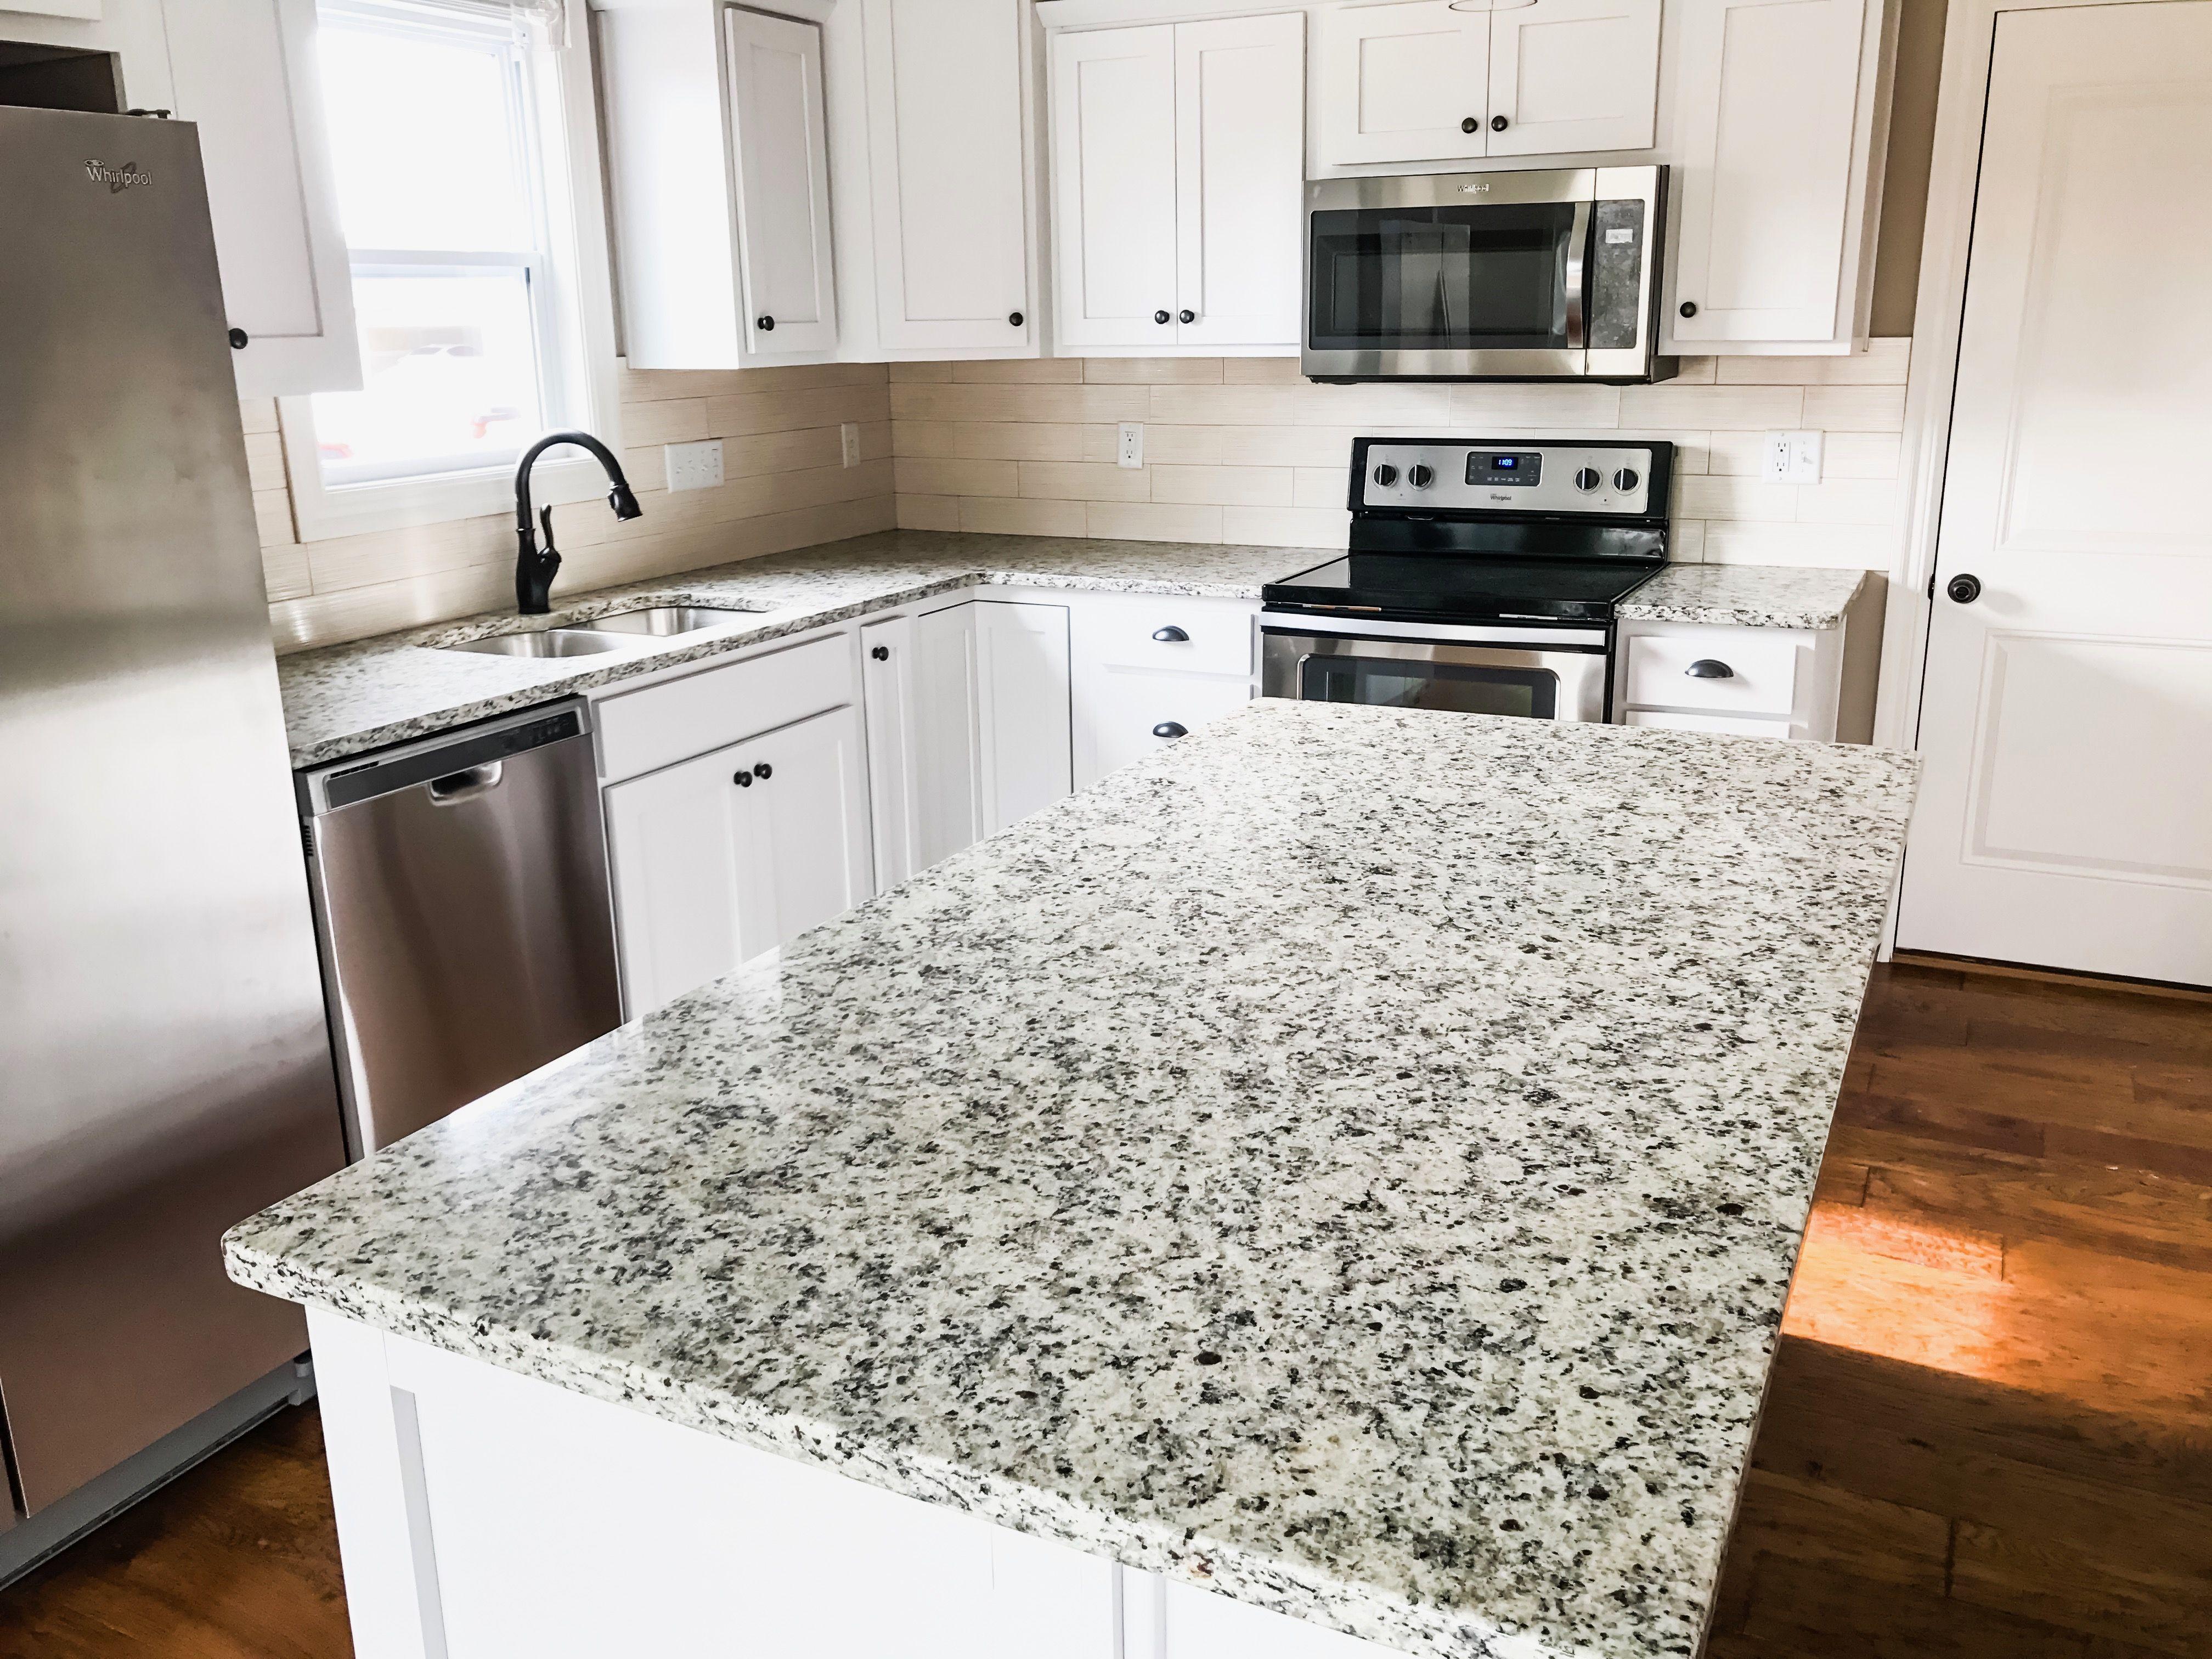 White indian granite countertop